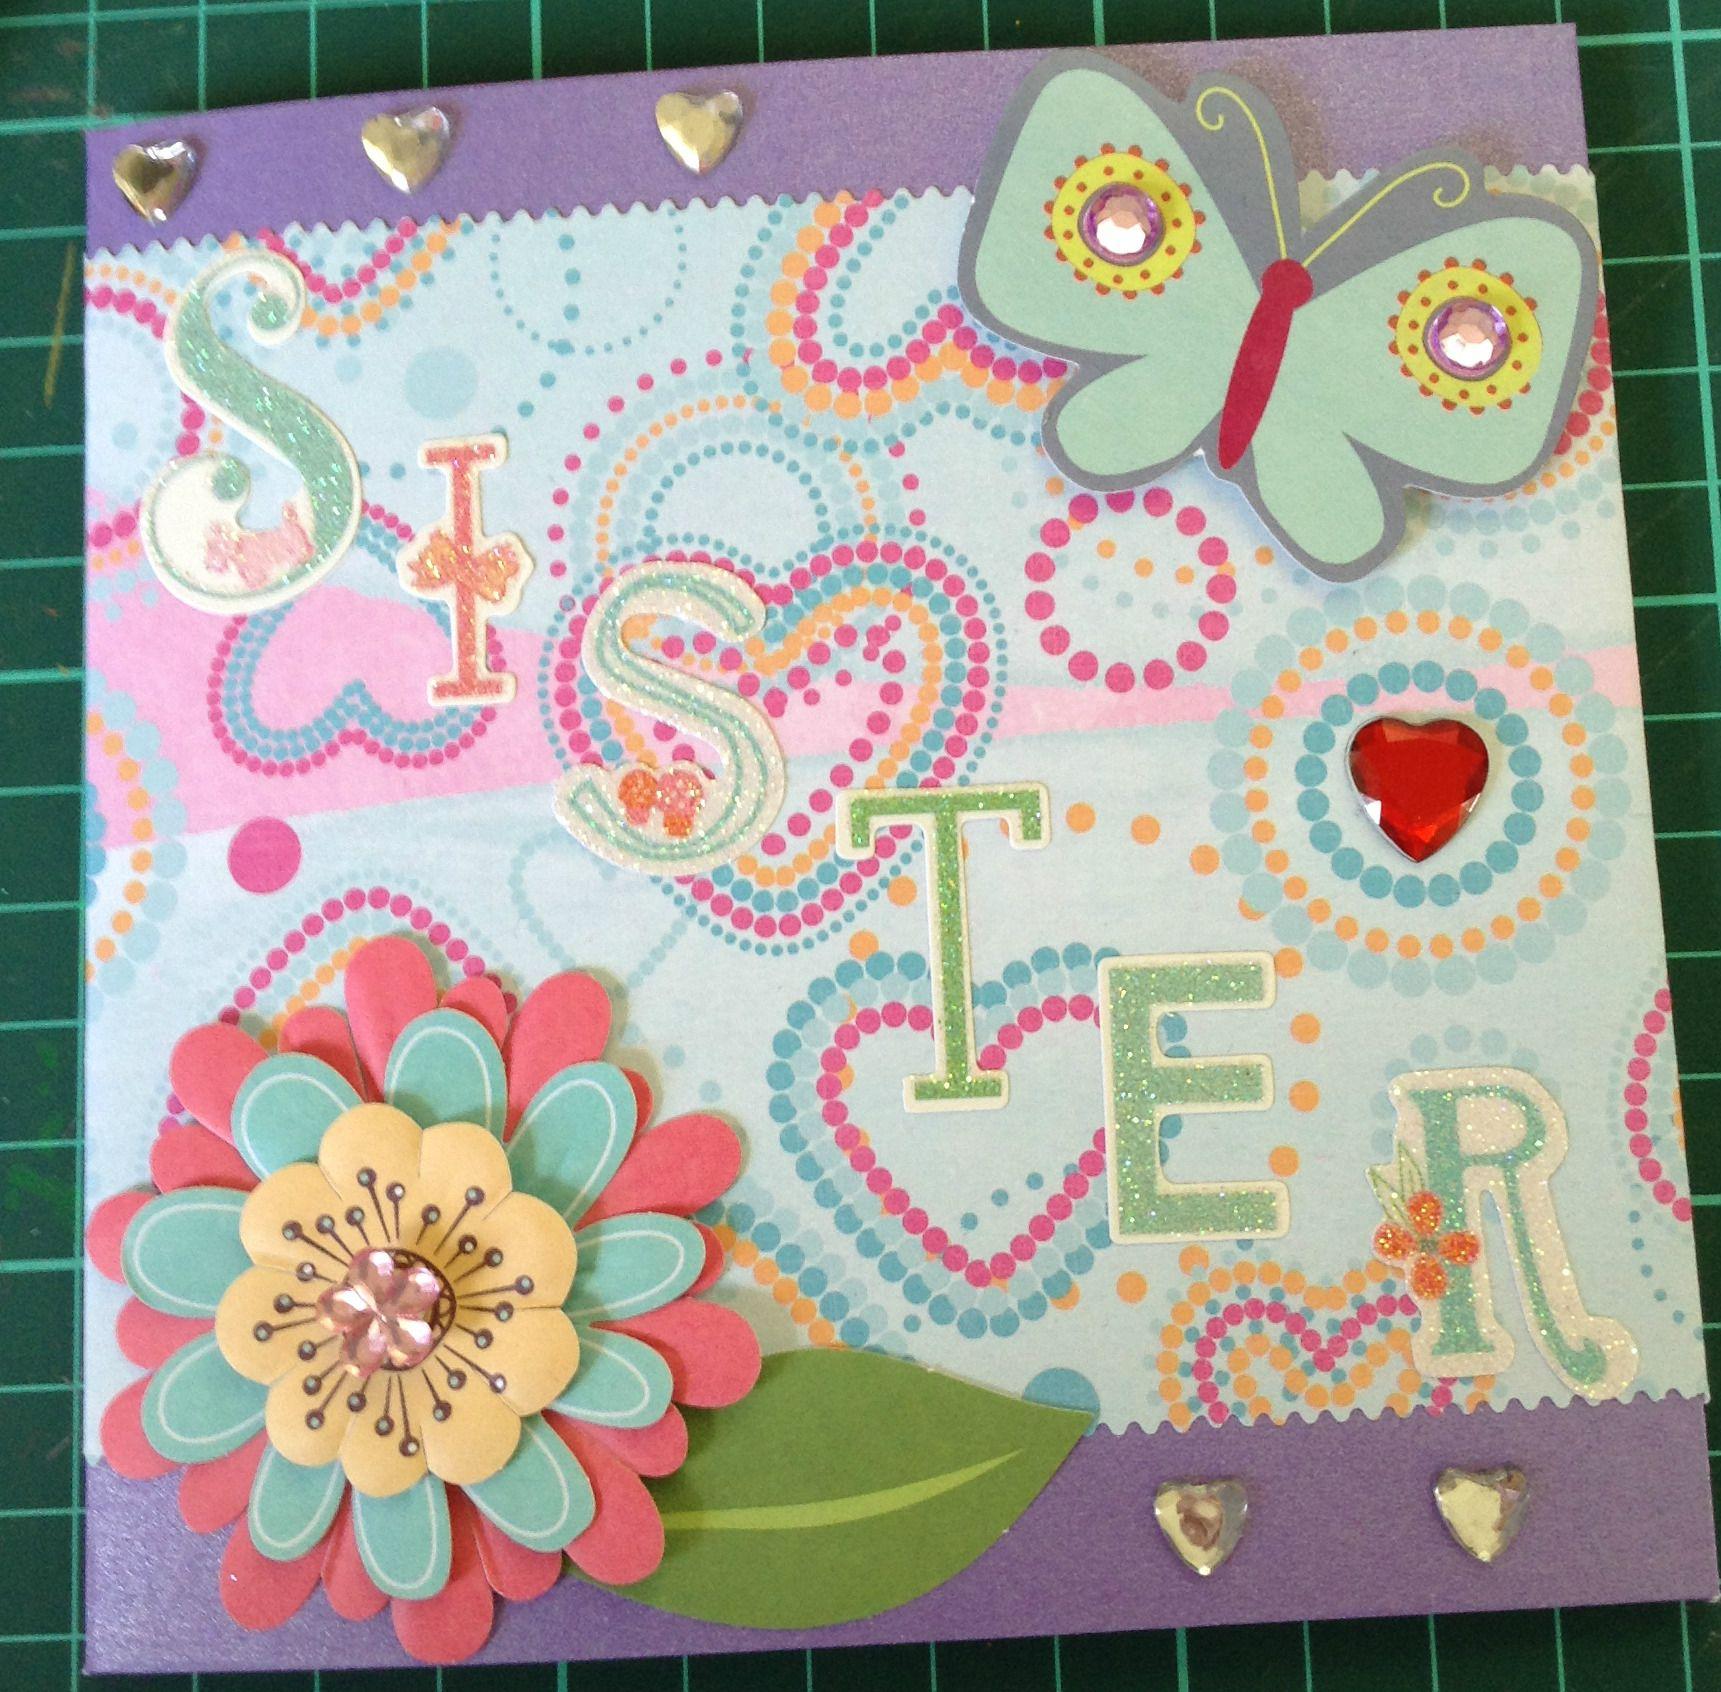 Sister Hand Made Birthday Card Hearts Flowers Birthday